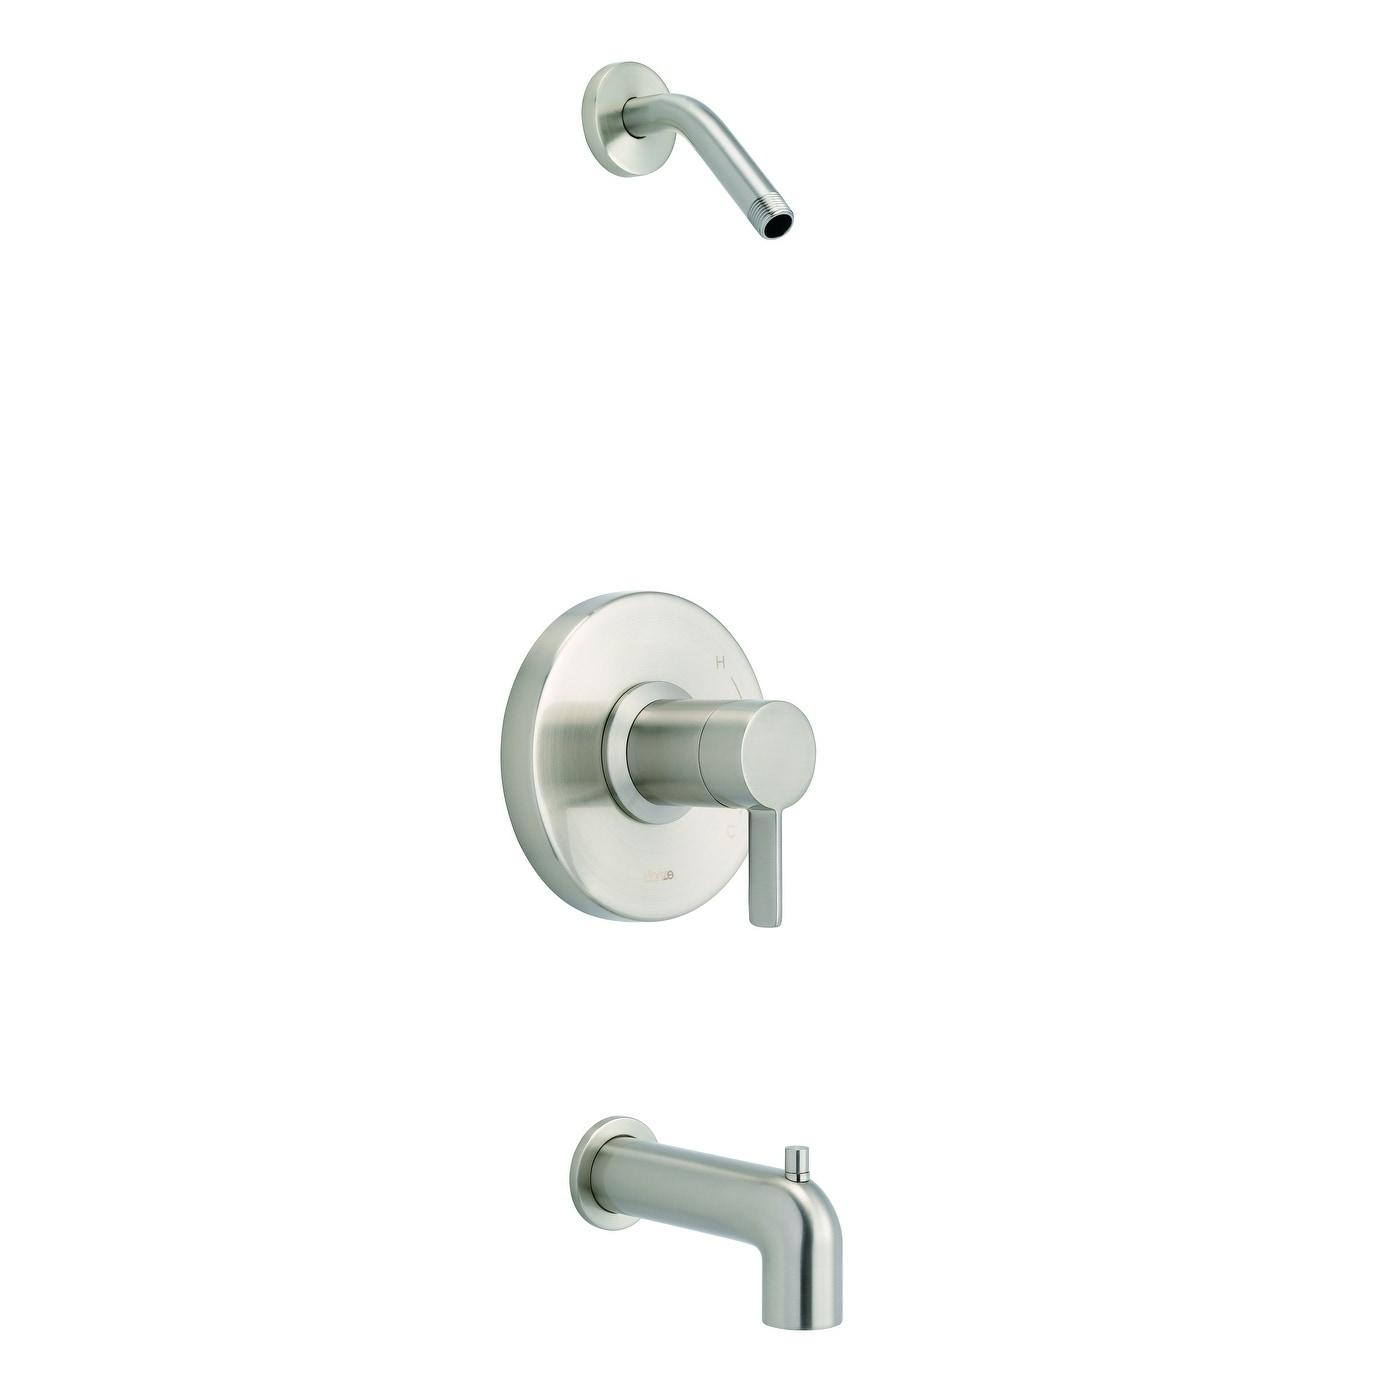 Amalfi 1h Tub Shower Trim Kit Treysta Cartridge W Diverter On Spout Less Showerhead Brushed Nickel